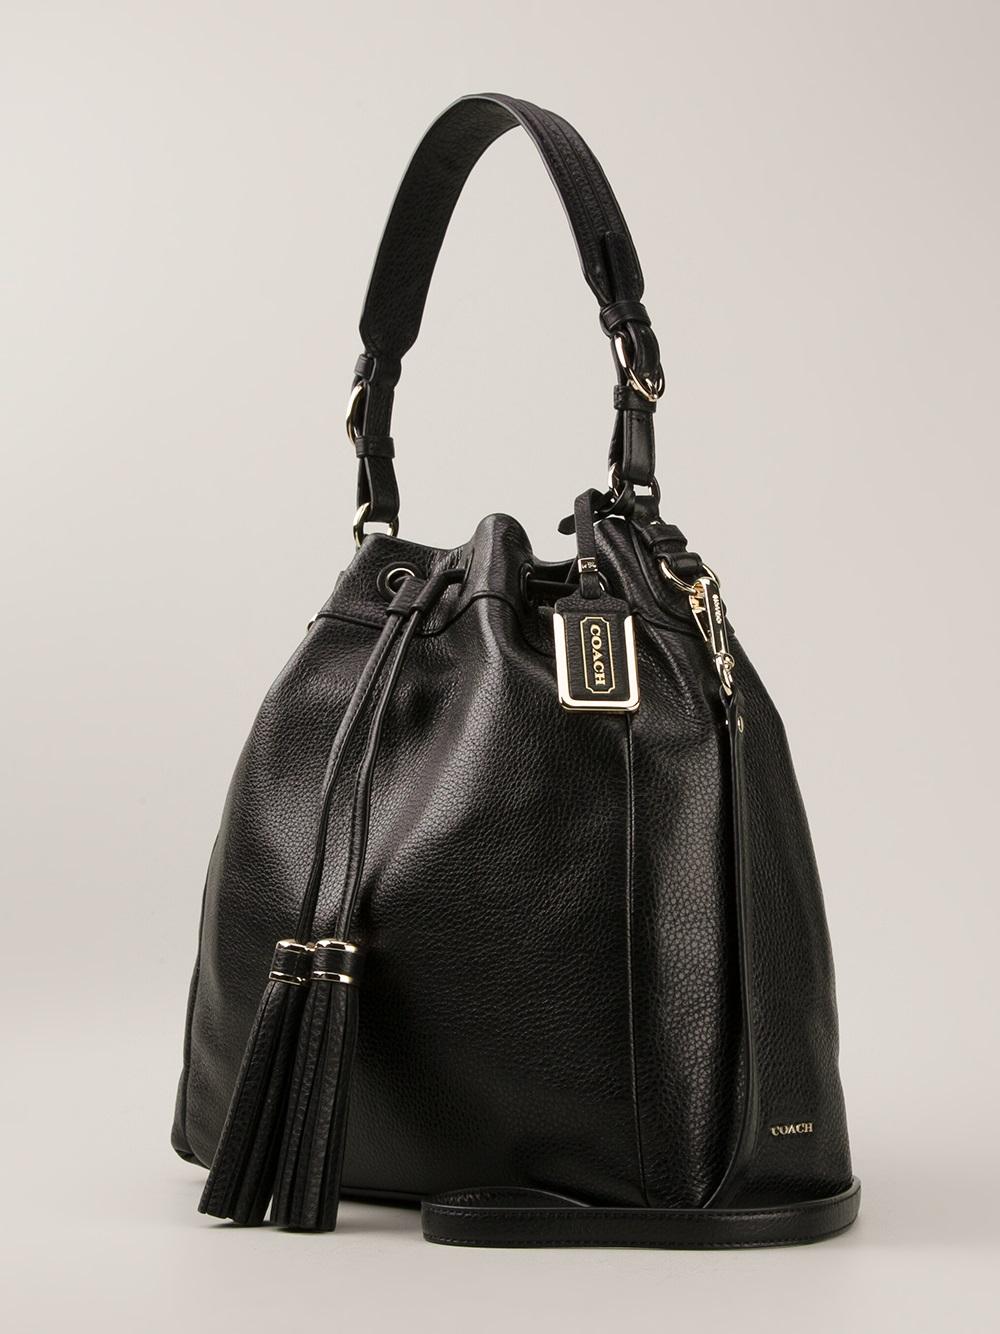 Coach Madison Pinnacle Shoulder Bag in Black - Lyst